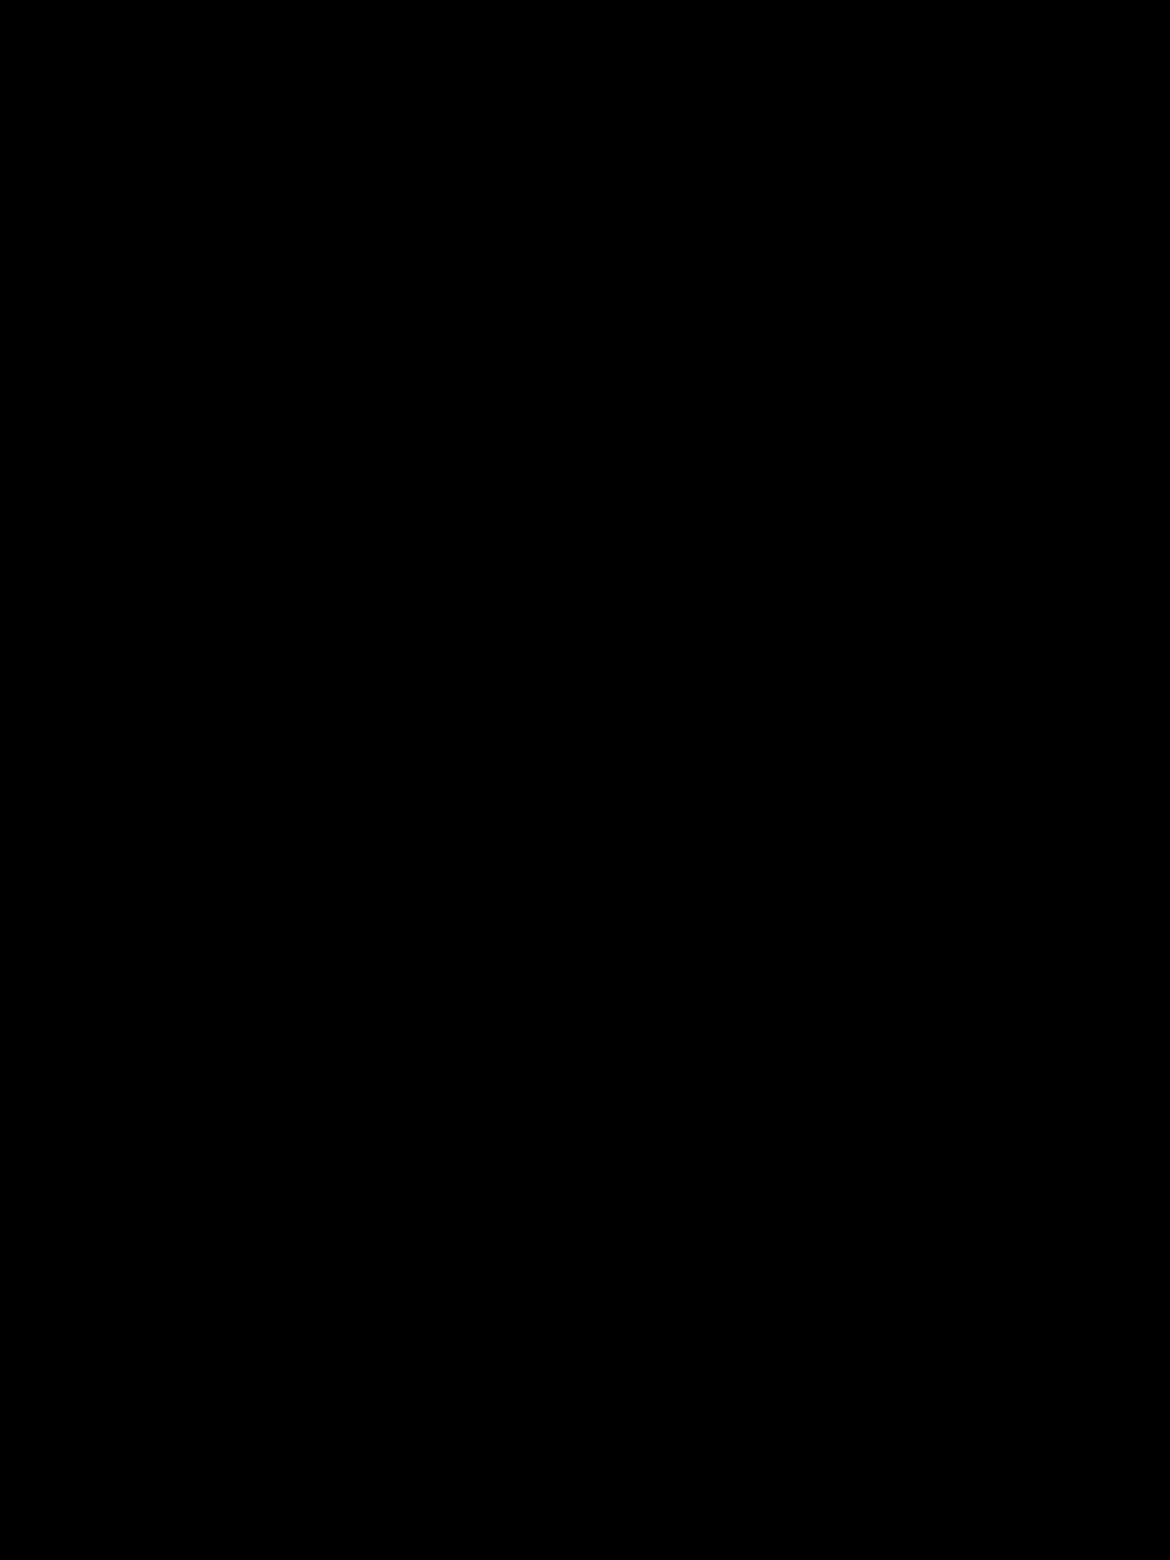 Milan Fashion Week day 2 & Un abito leopardato